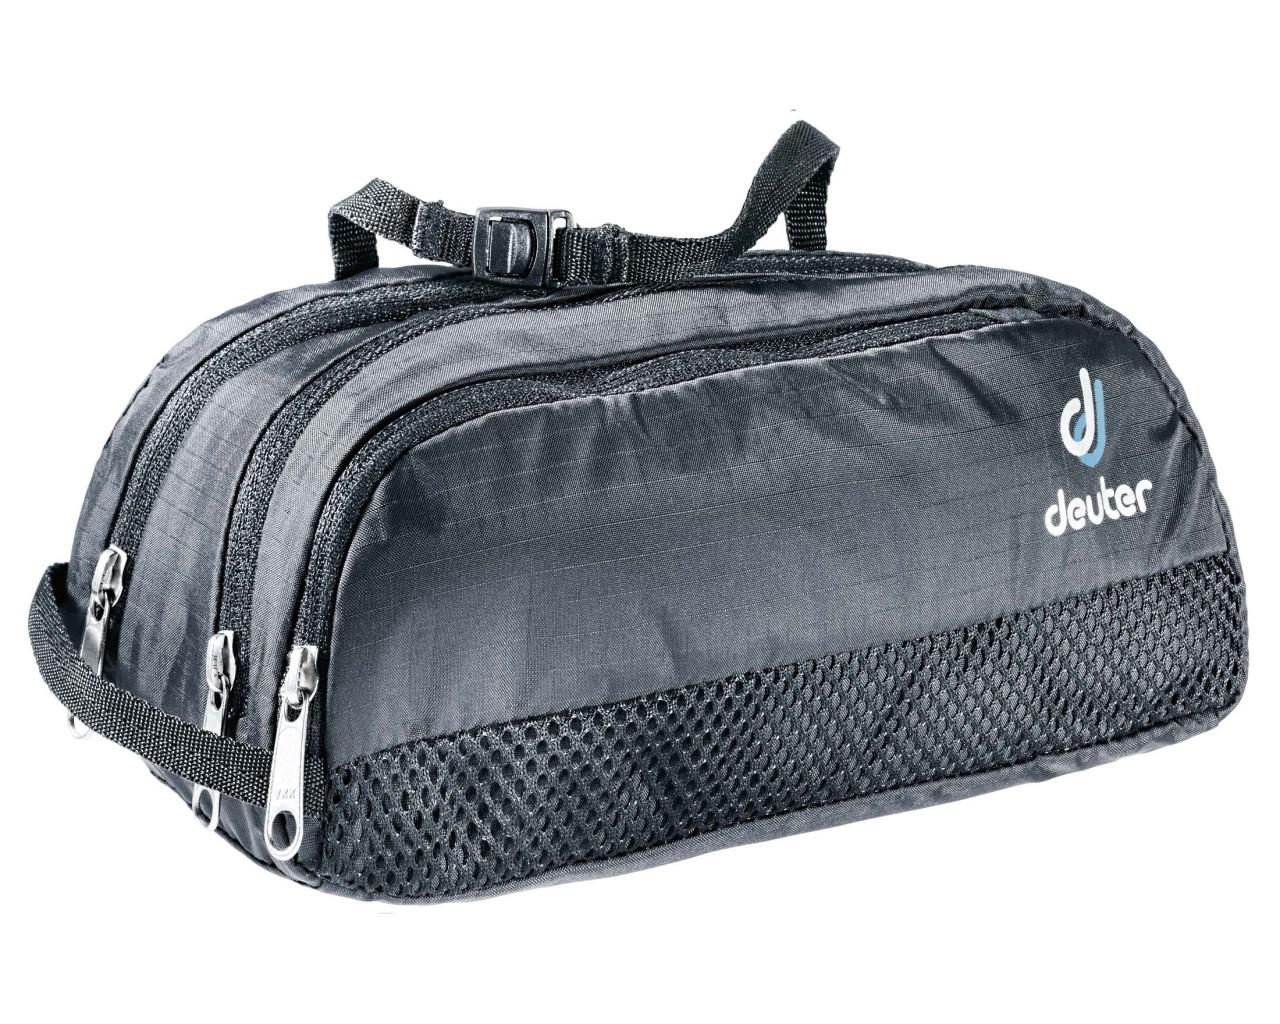 Deuter Wash Bag Tour II   black